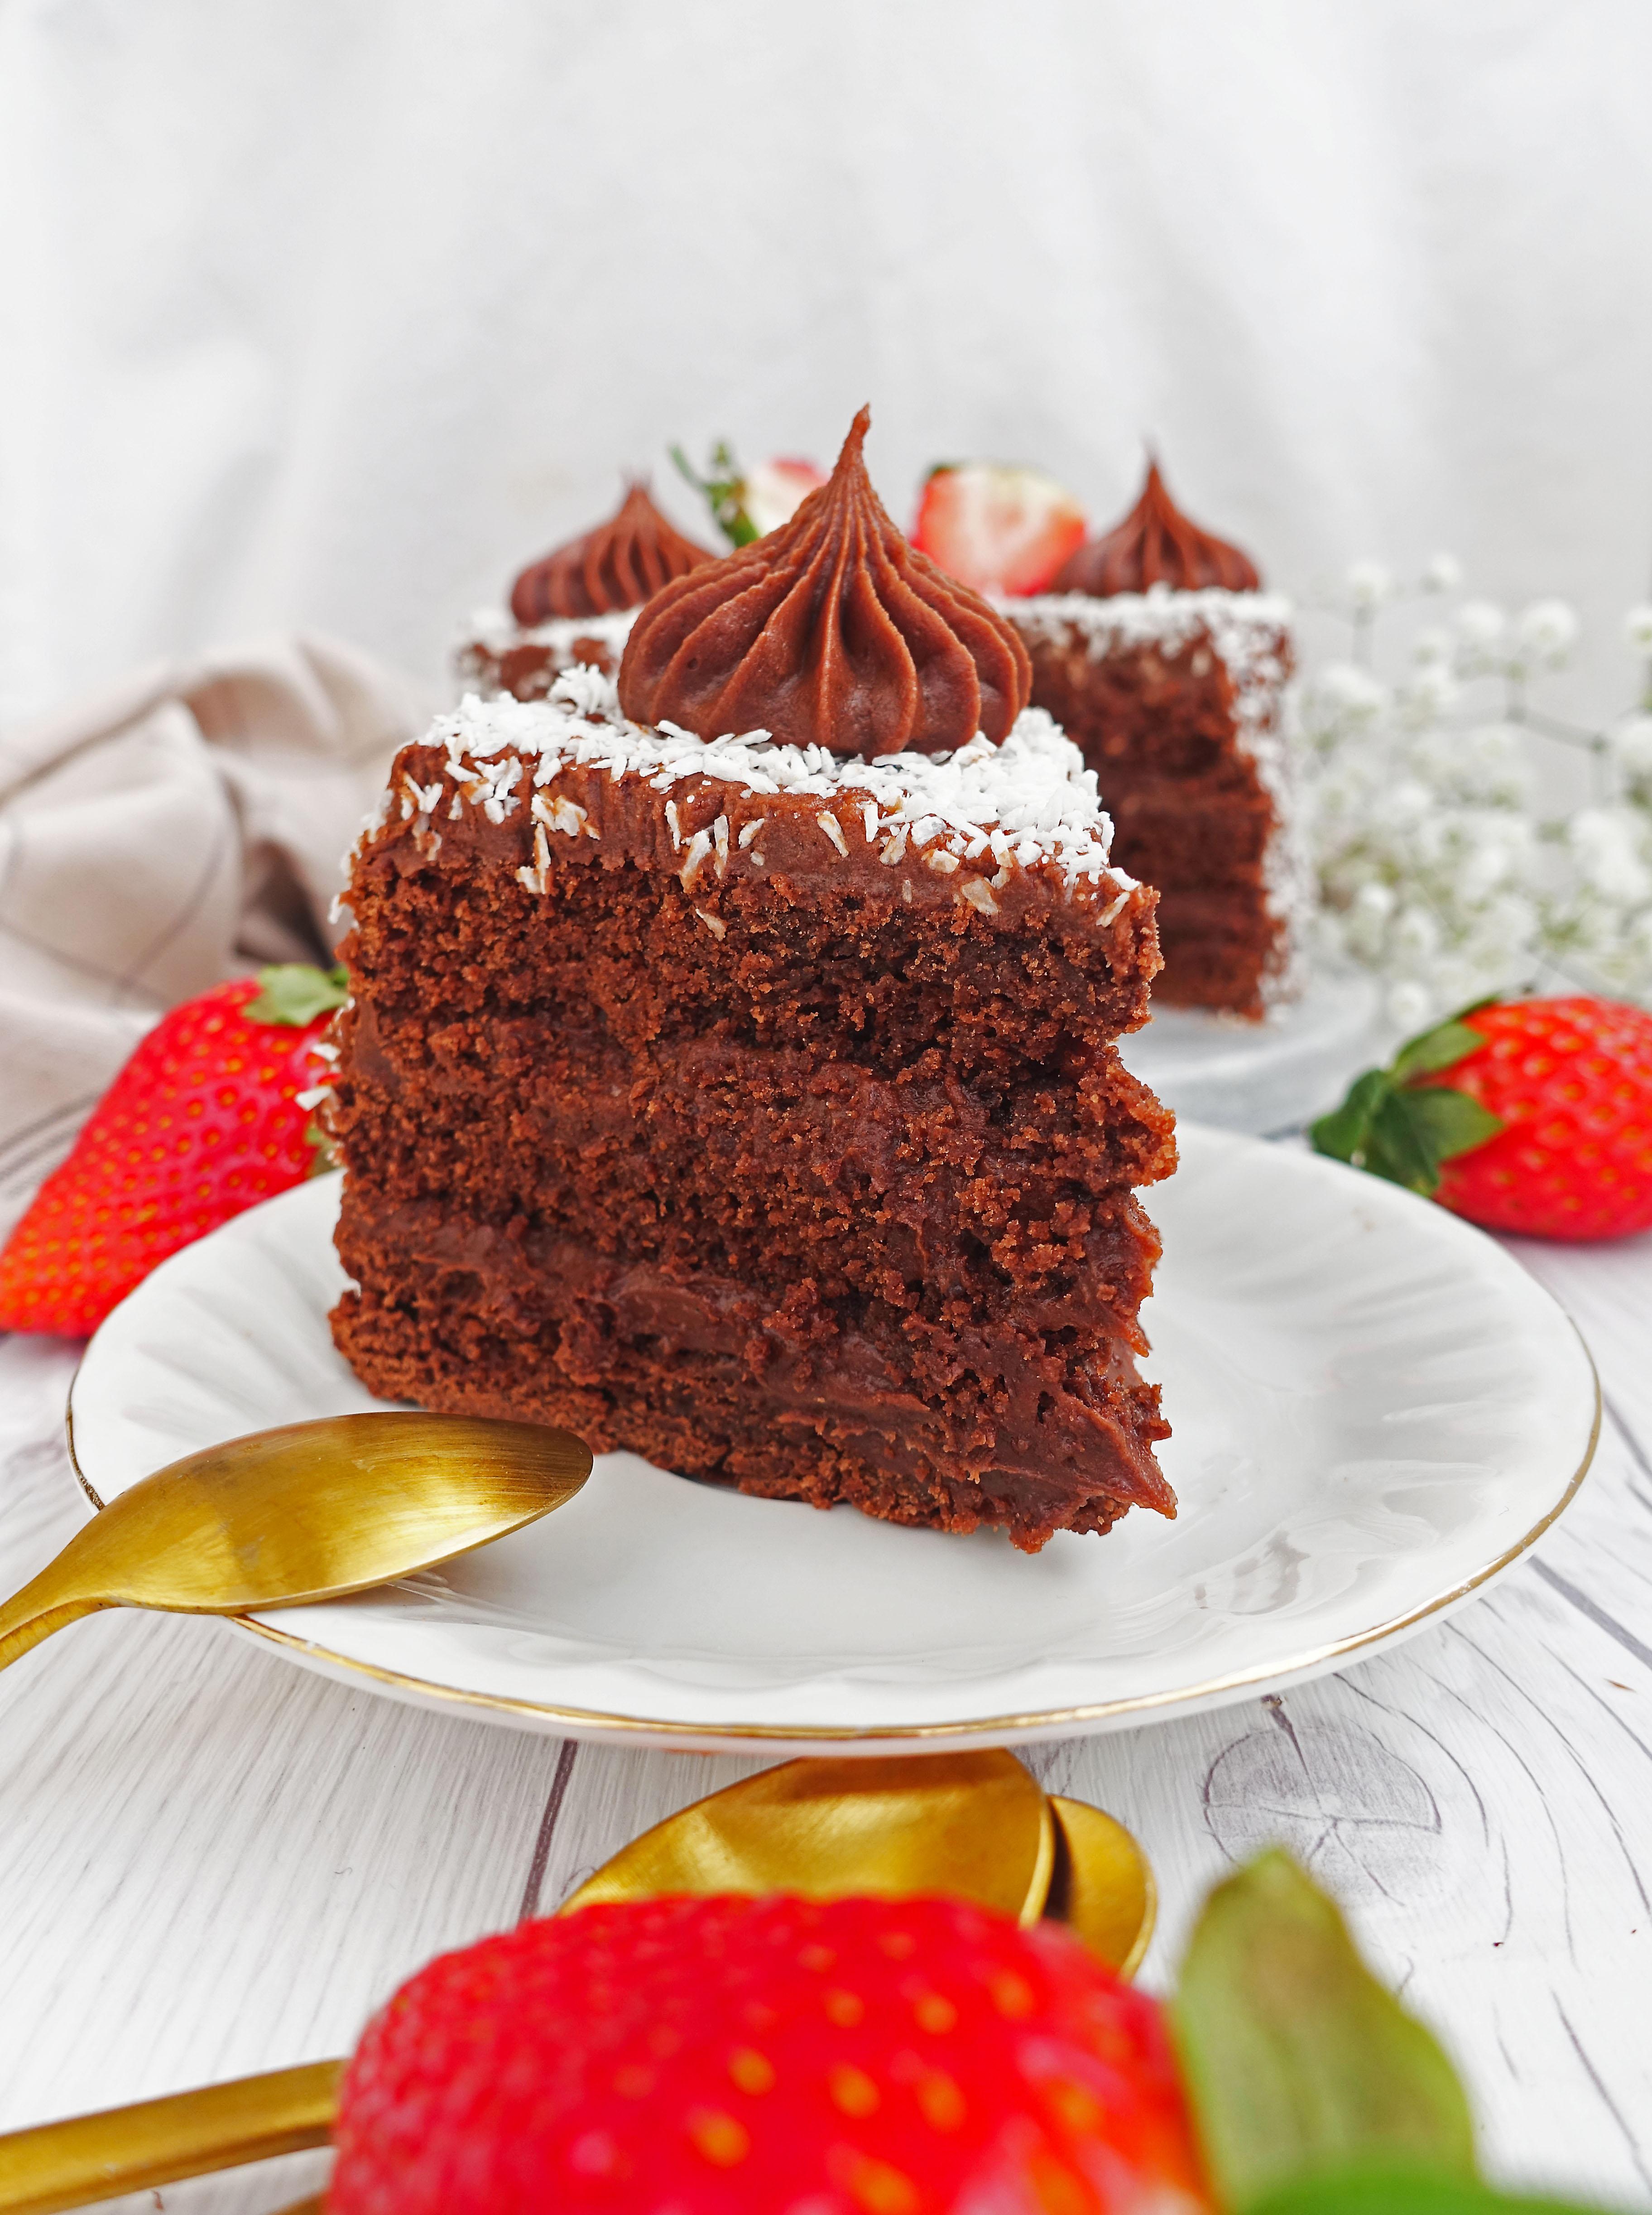 Vegansk kärleksmumstårta